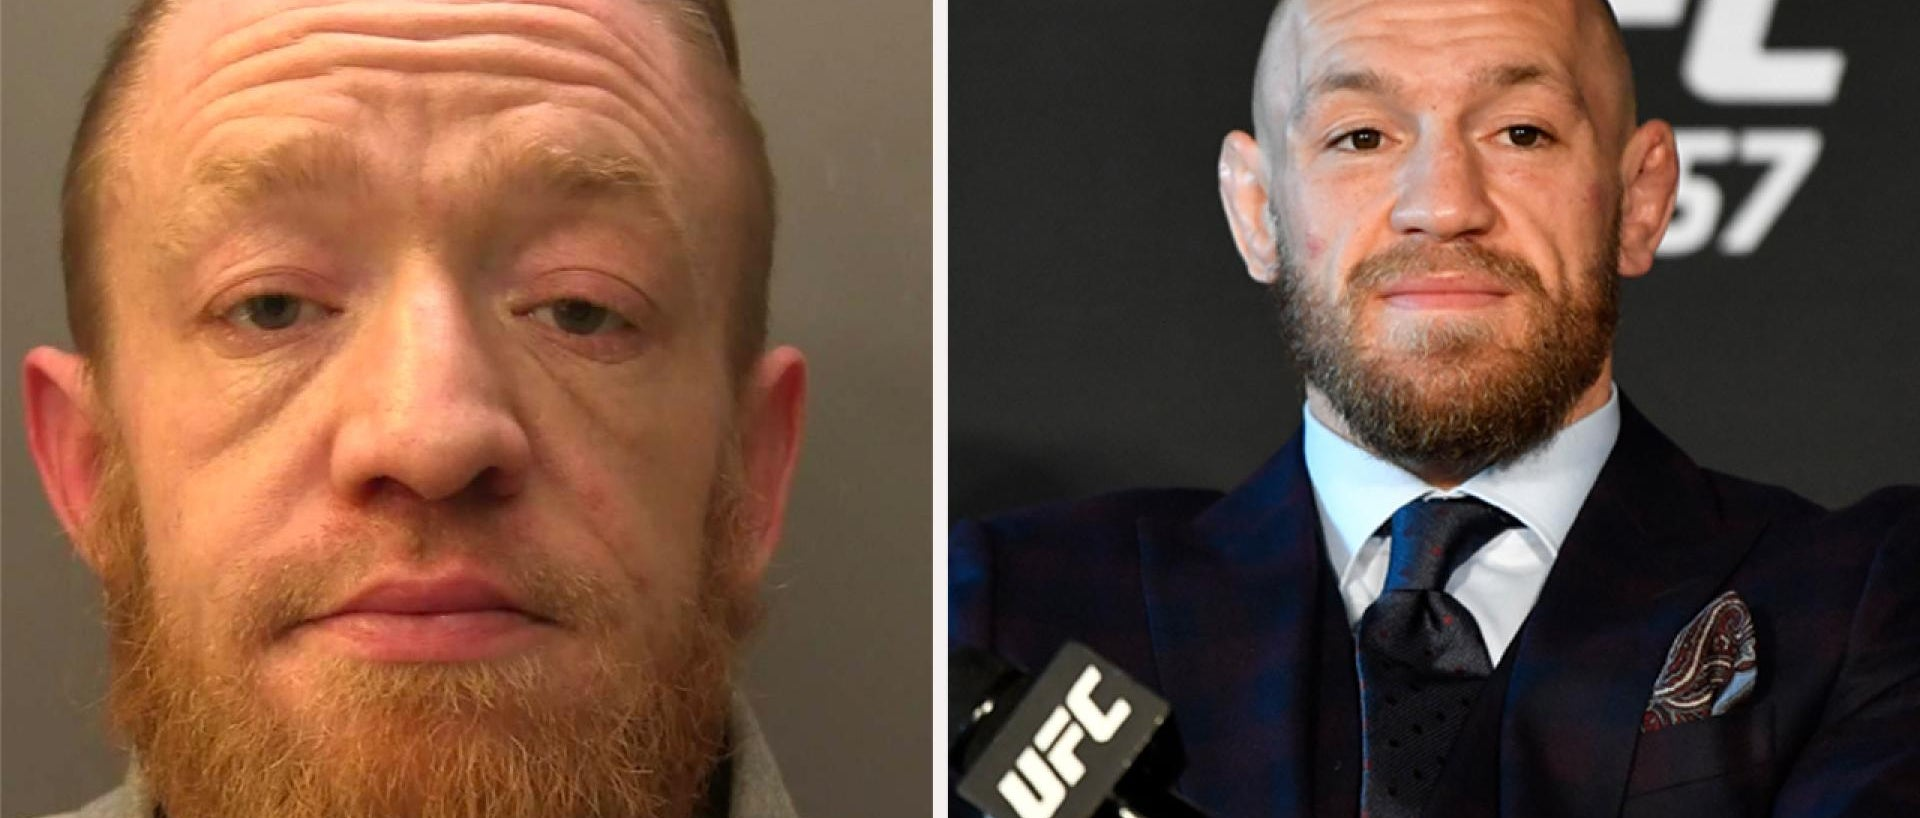 McGregor Lookalike